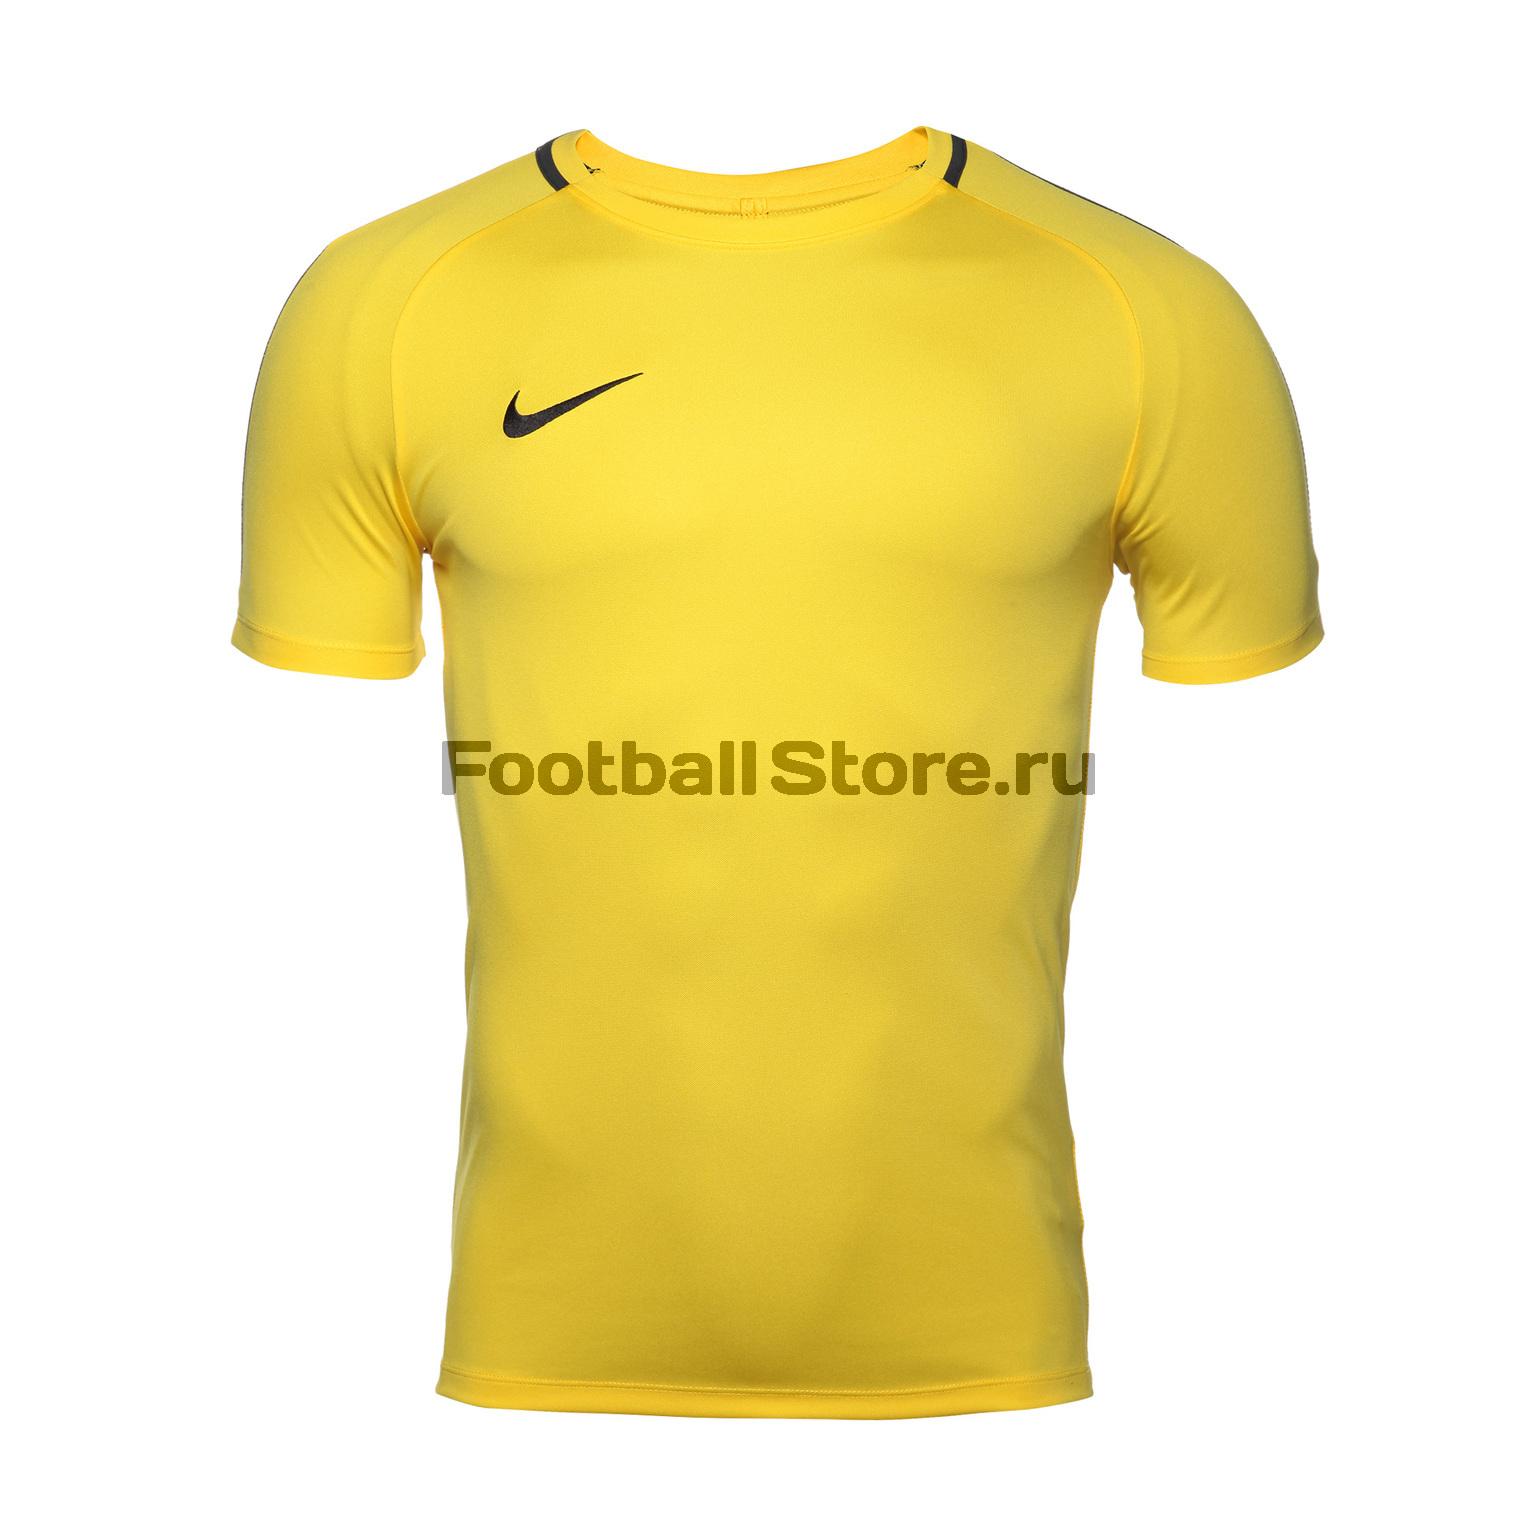 Футболка тренировочная Nike Dry Academy 18 893693-719 цена 2017